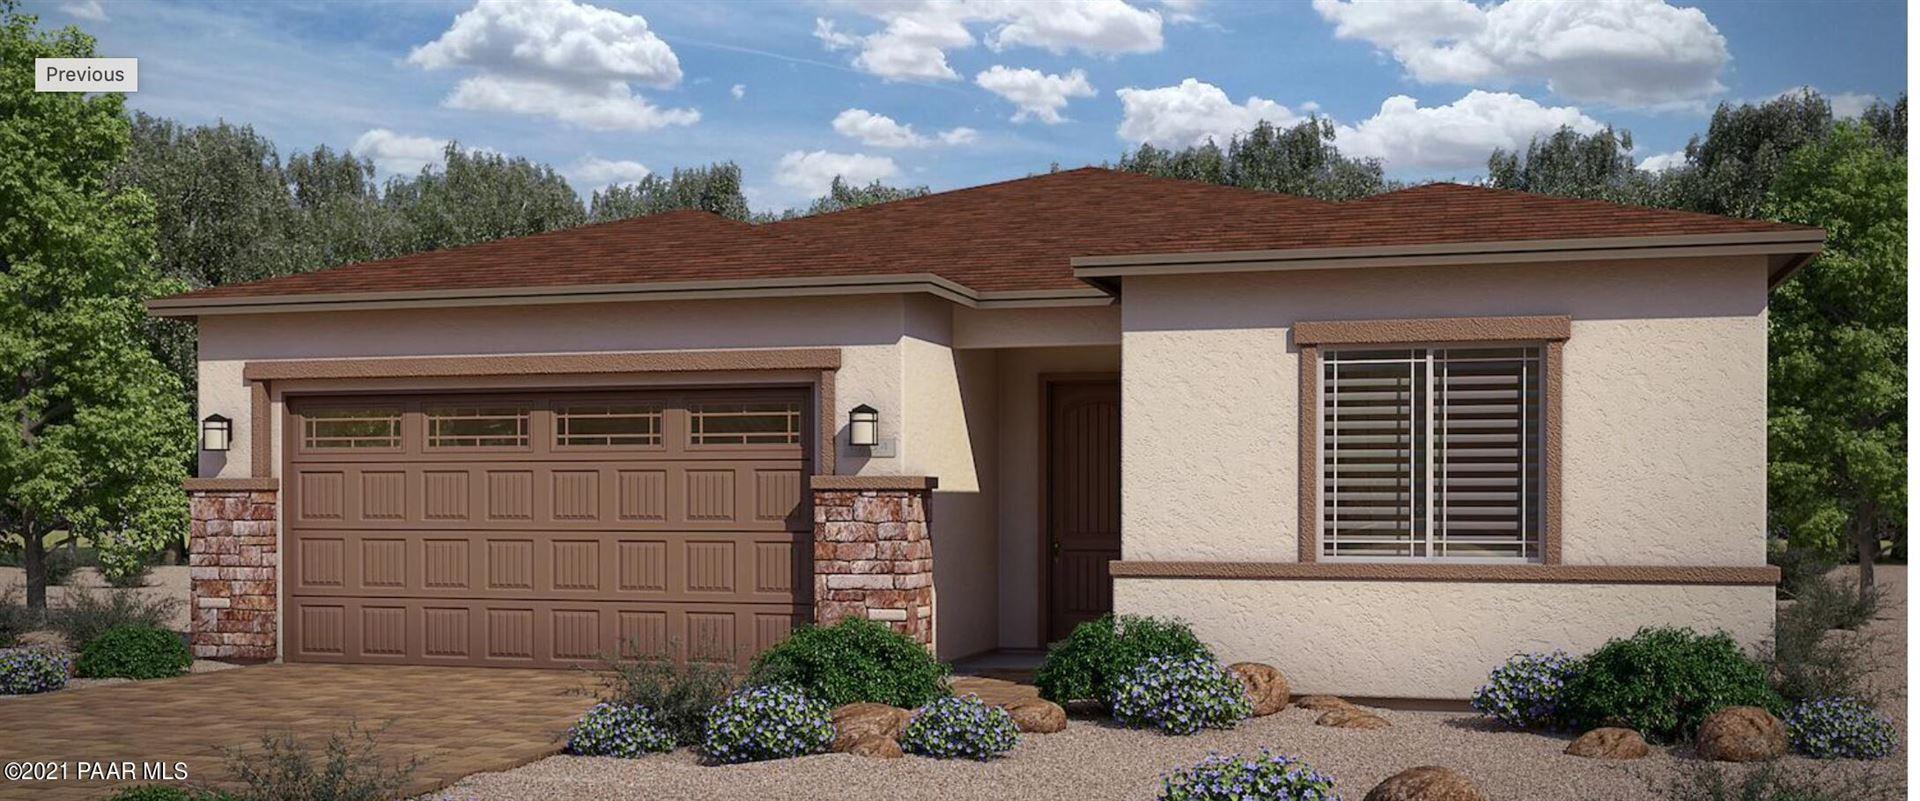 Photo of 7868 E Bella Vista Lane #Lot: 1215, Prescott Valley, AZ 86315 (MLS # 1040369)